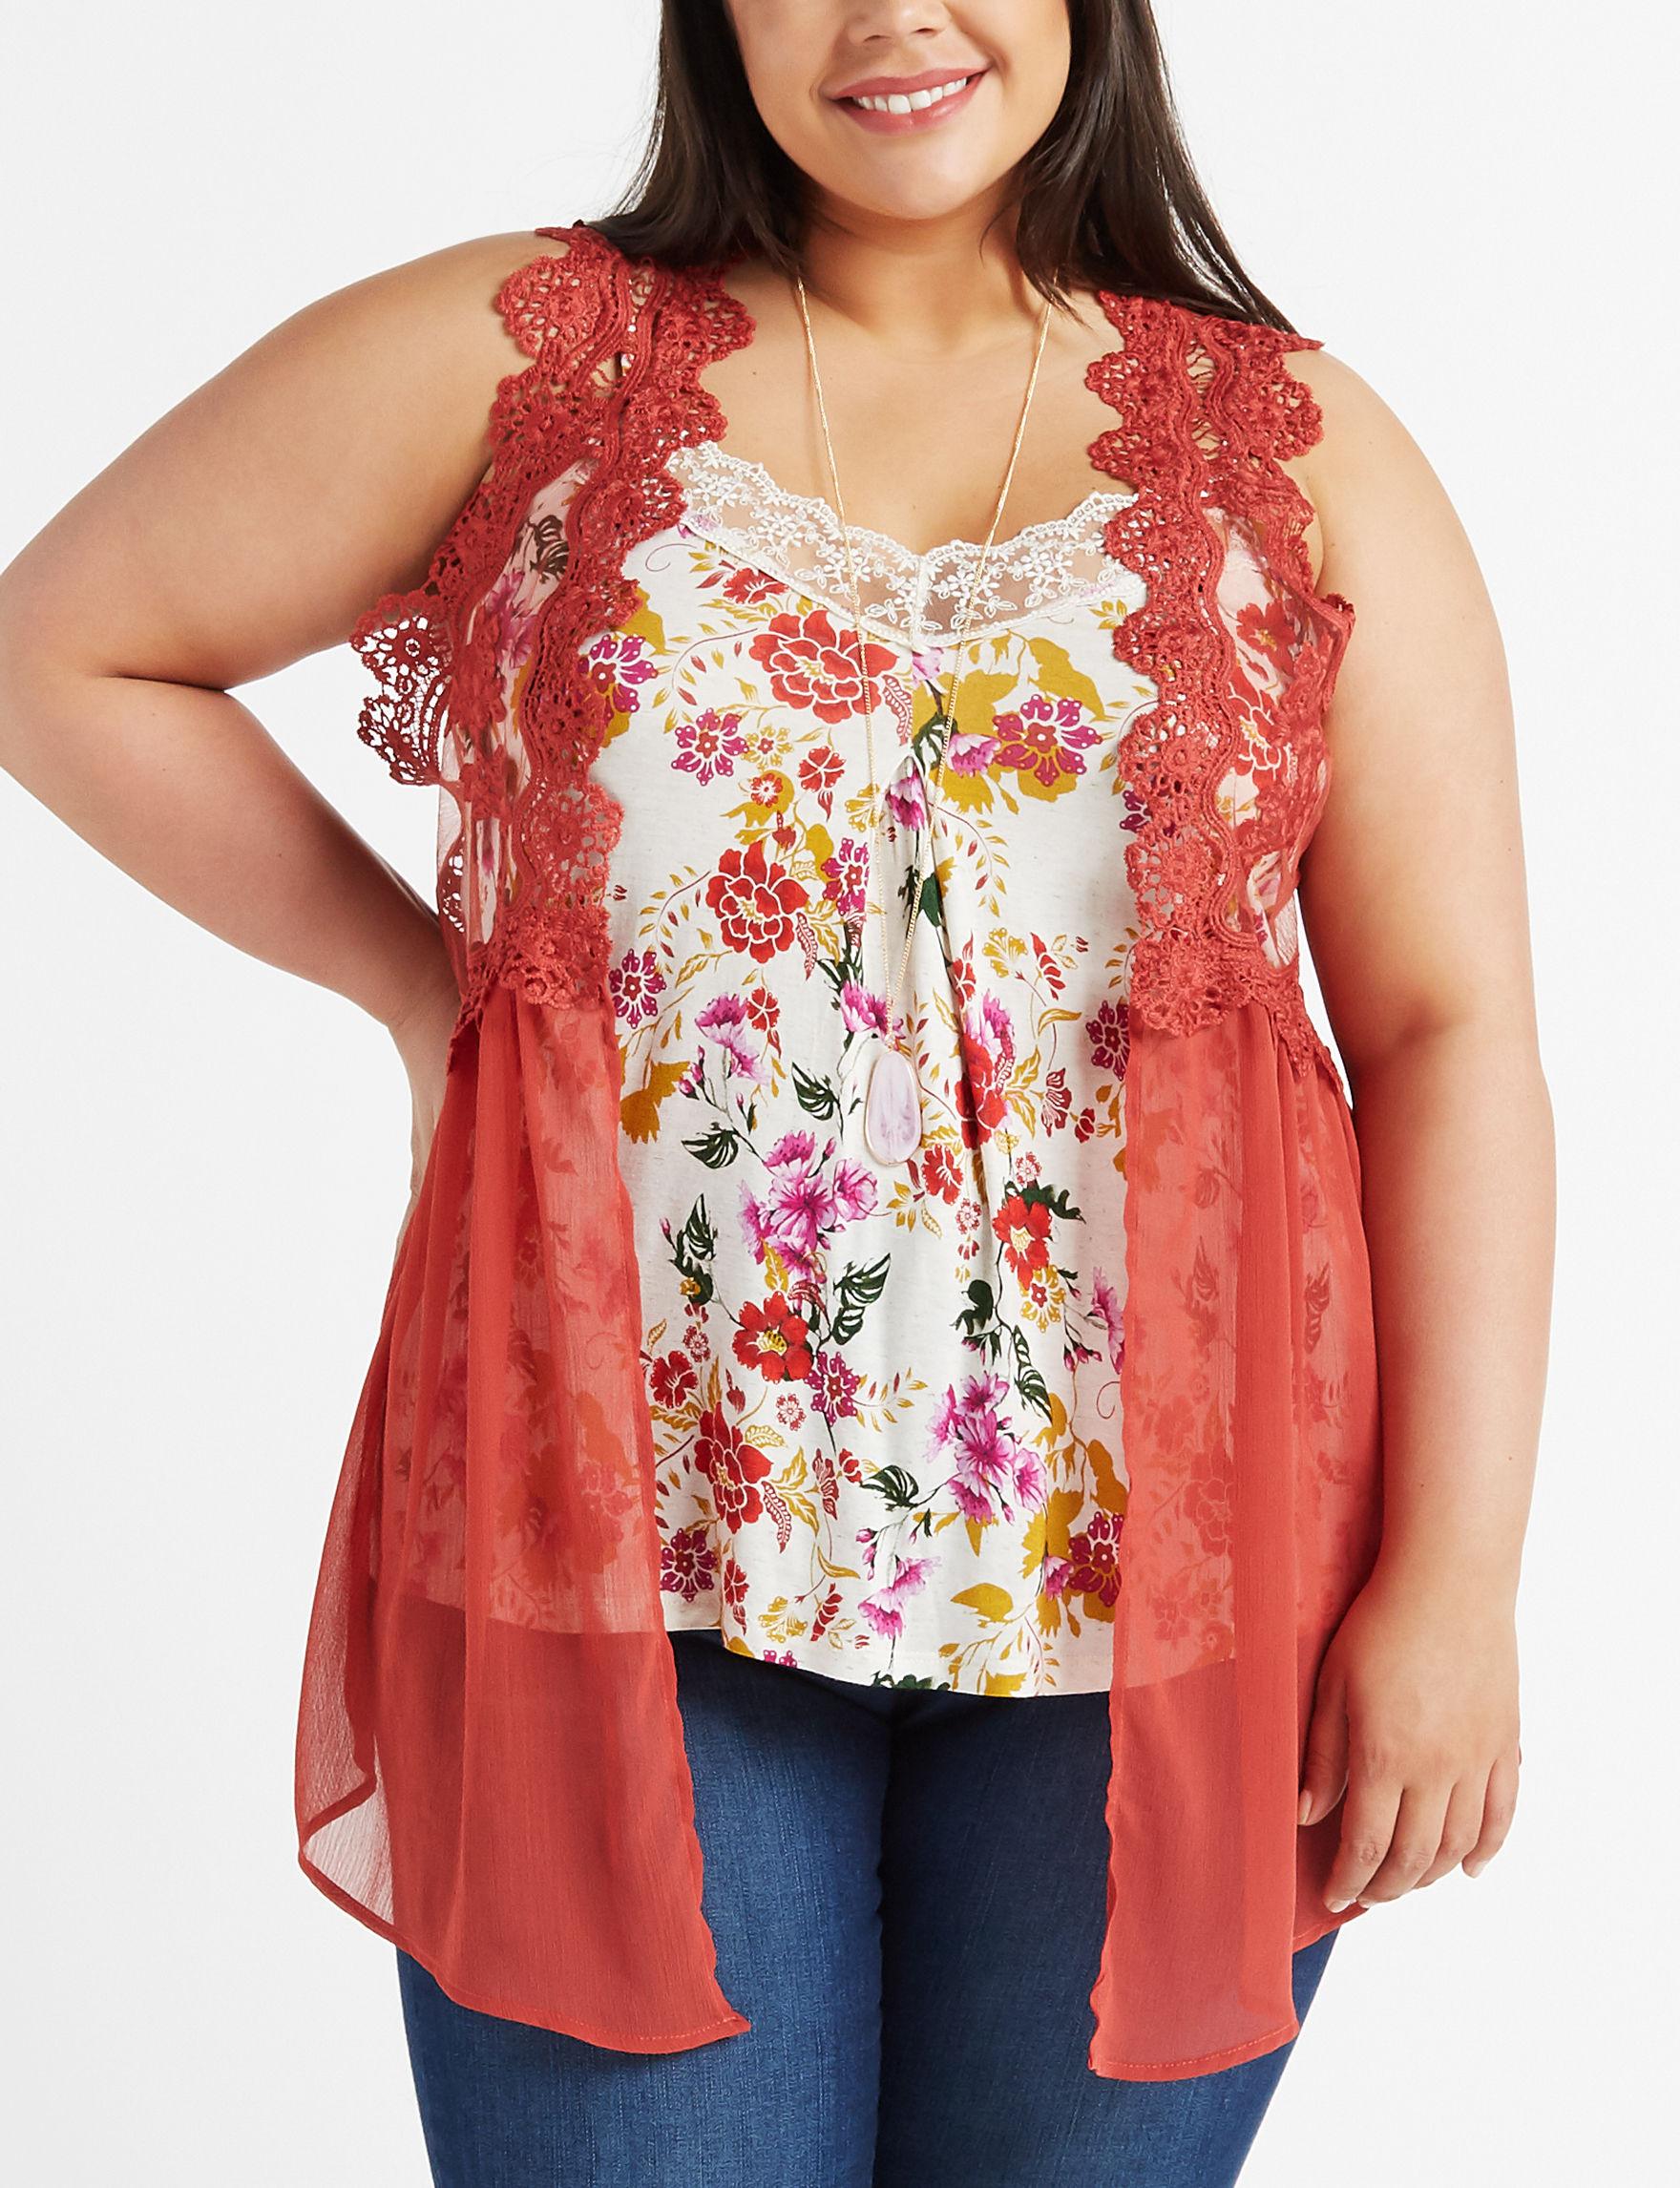 Self Esteem Beige Kimonos & Toppers Shirts & Blouses